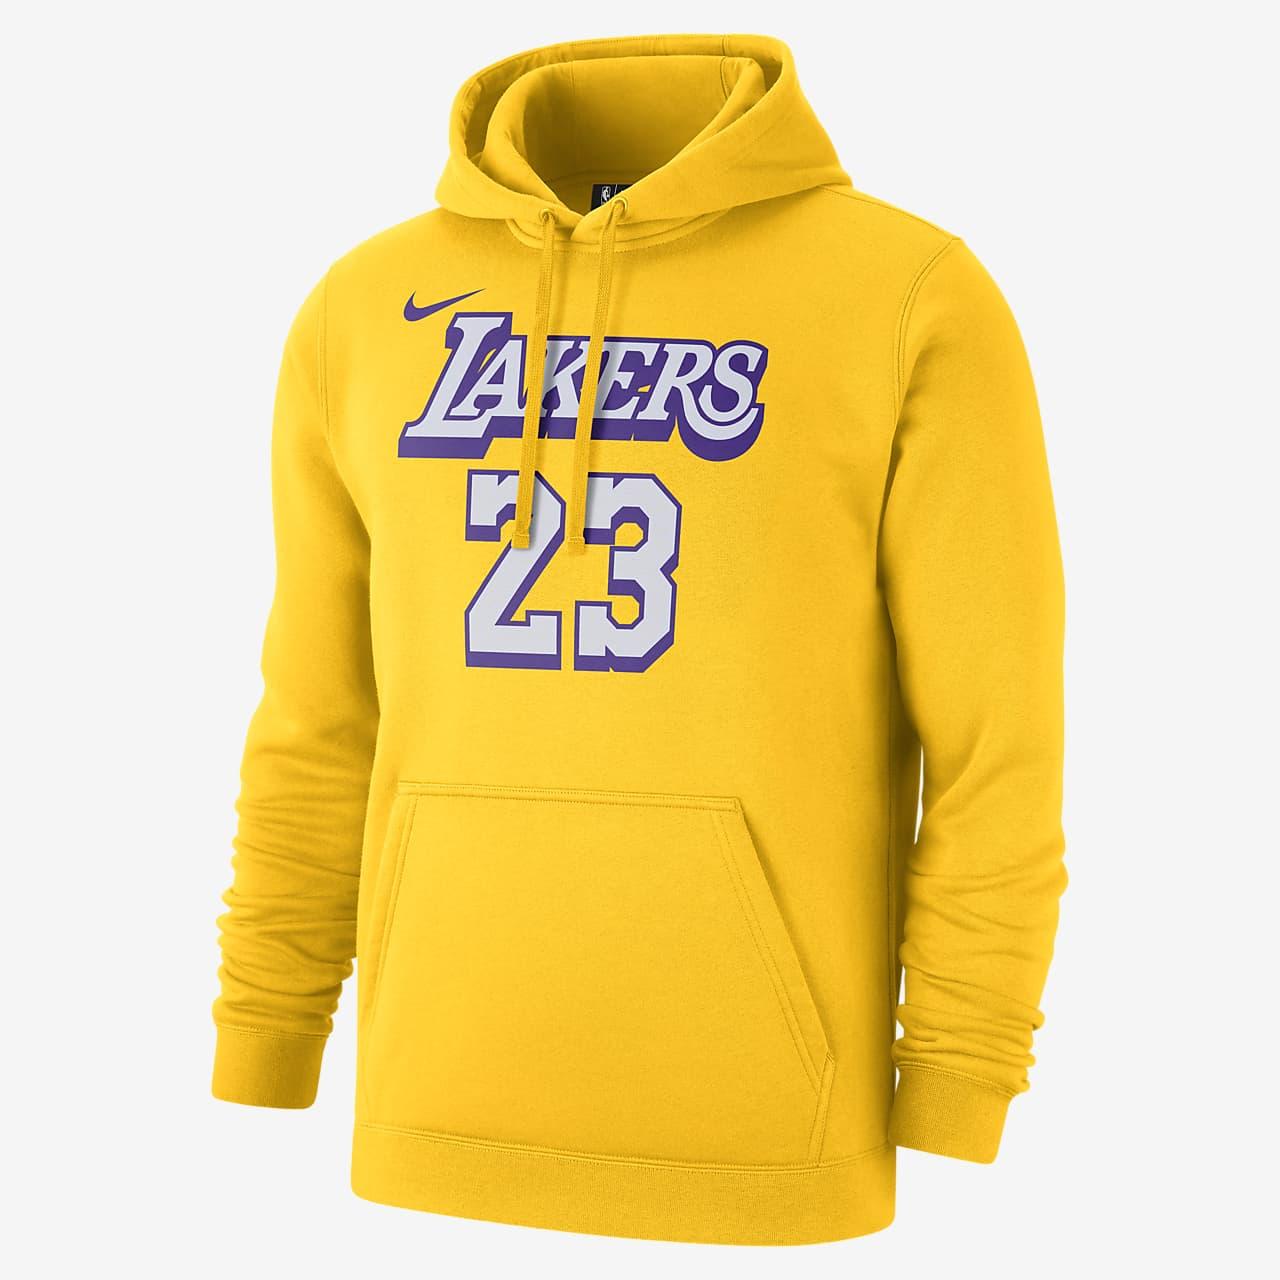 洛杉矶湖人队 (LeBron James) City Edition Nike NBA 男子连帽衫